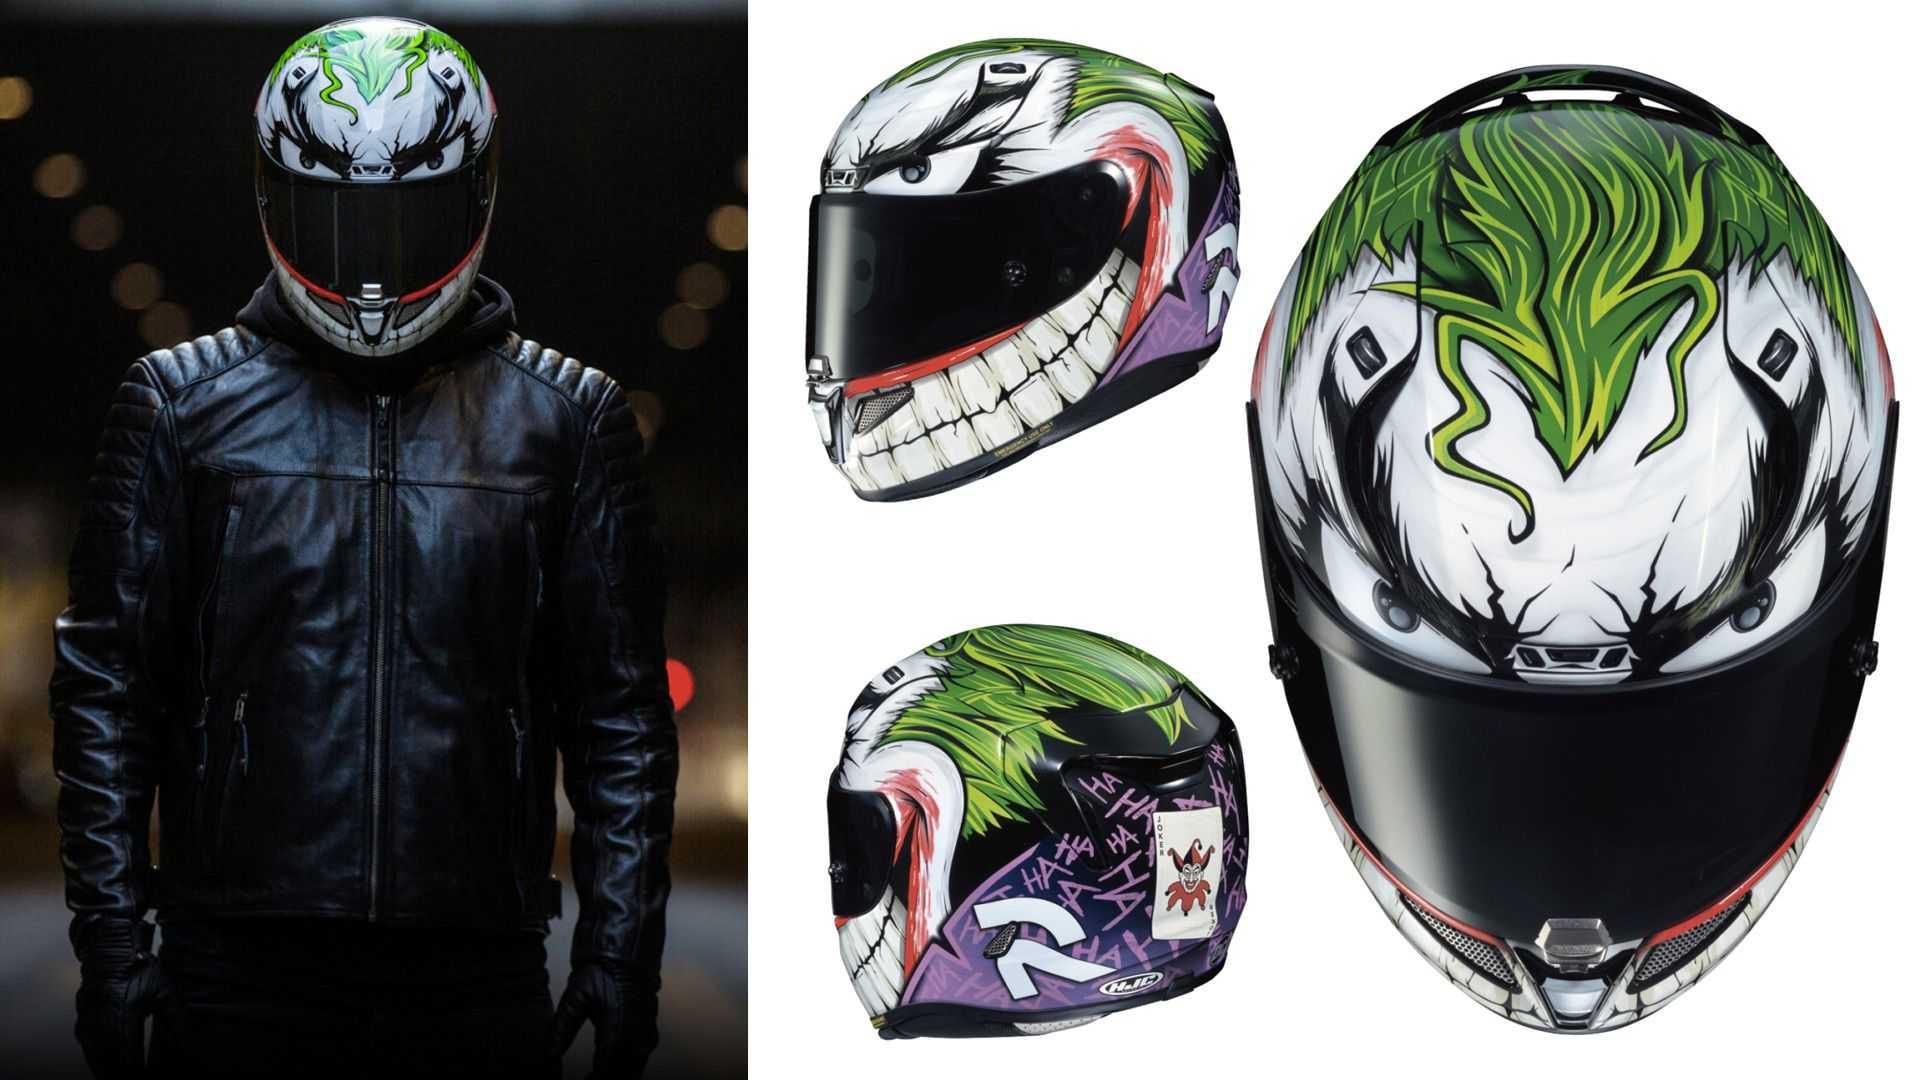 Intip Helm Full Face Bertema ala Joker, Sebegini Harganya - JPNN.com